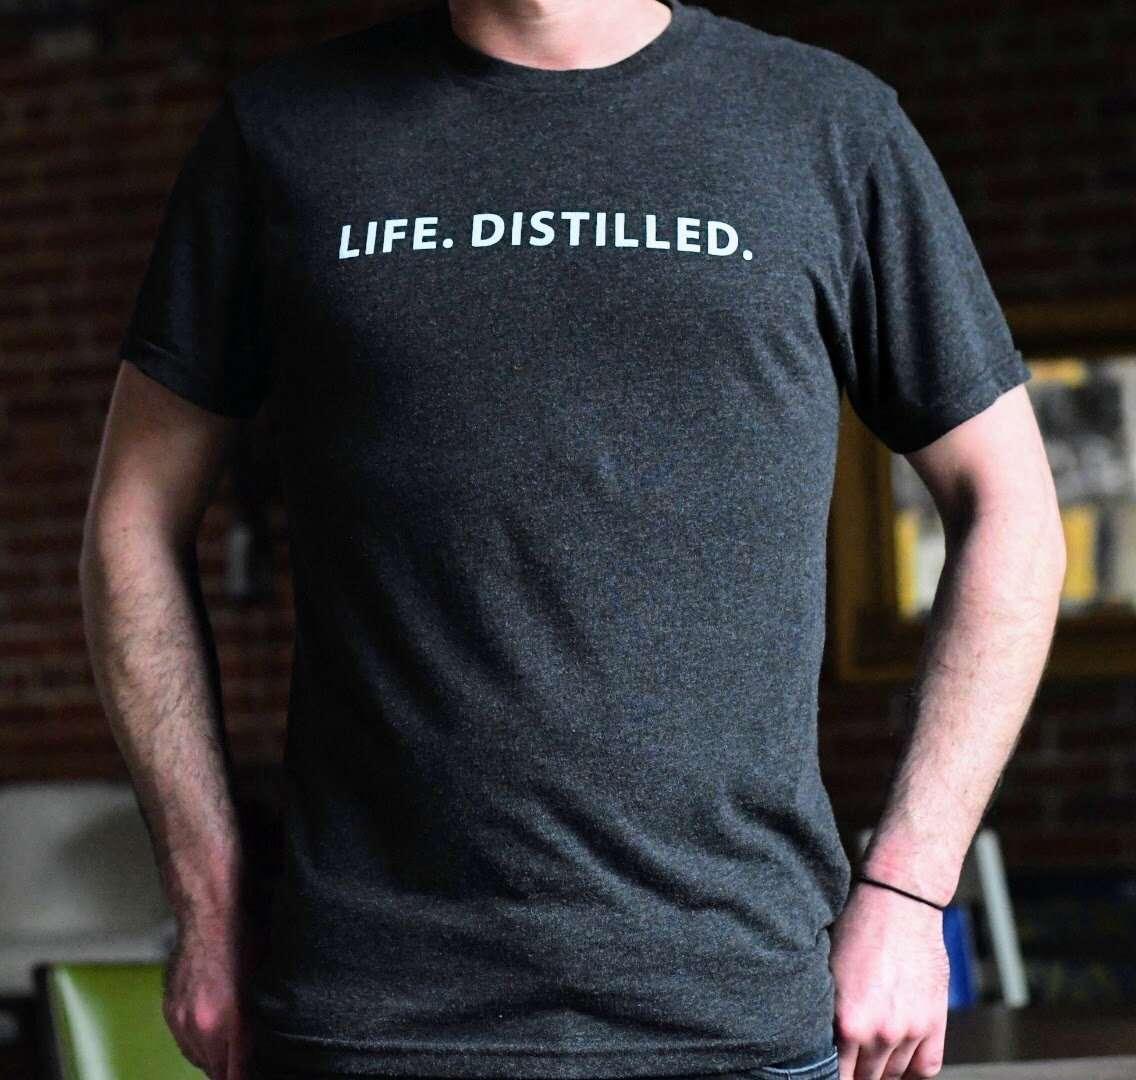 Life. Distilled.